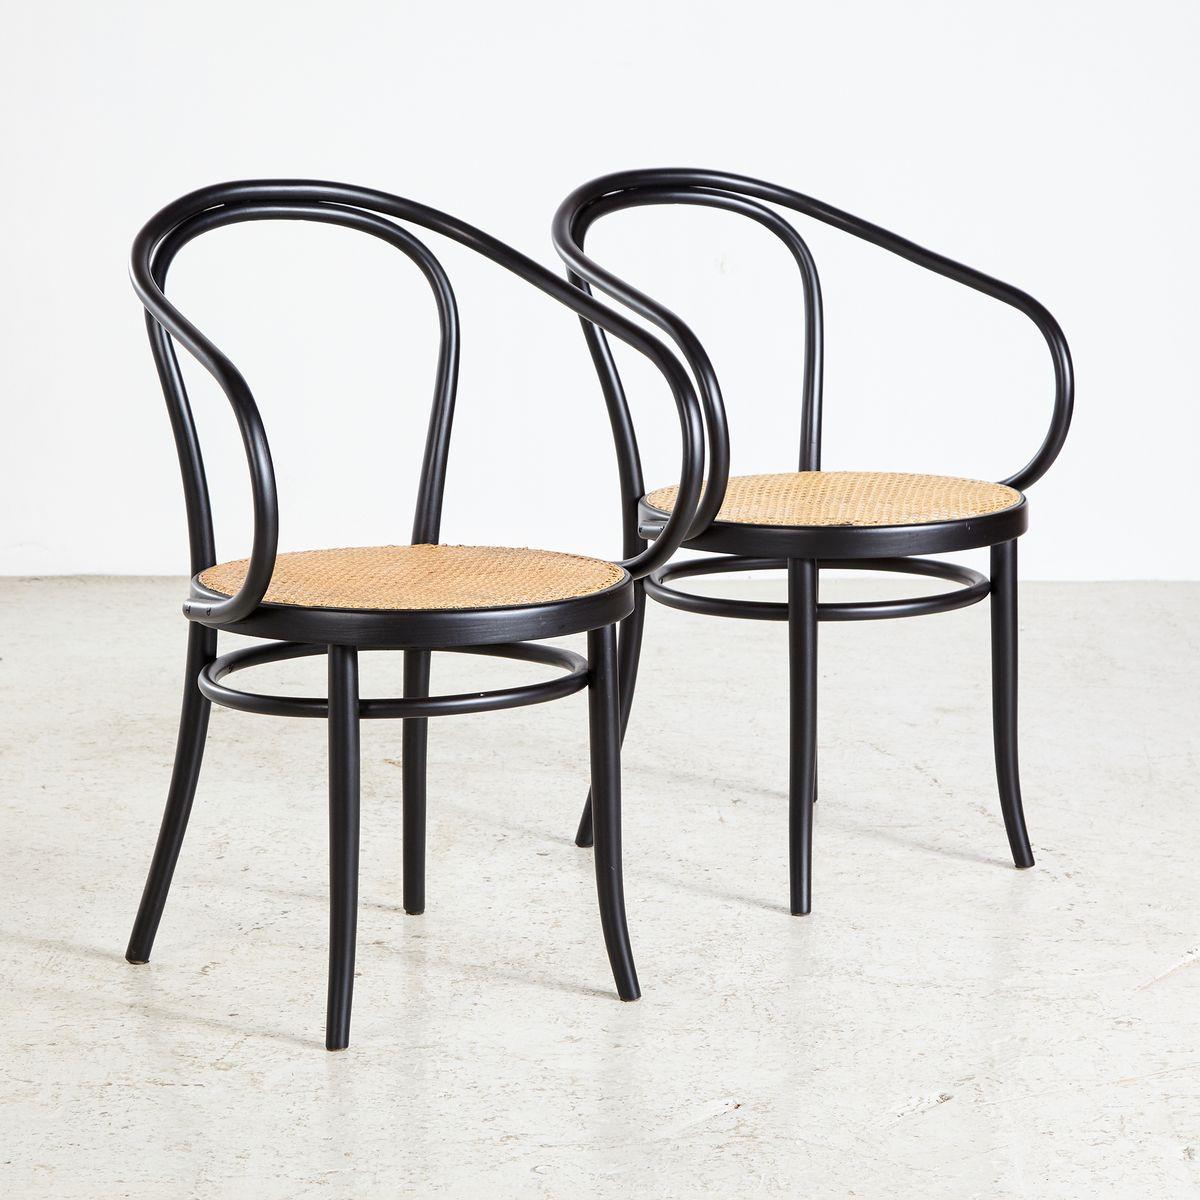 nr 209 stuhl von michael thonet f r thonet 1920er bei pamono kaufen. Black Bedroom Furniture Sets. Home Design Ideas